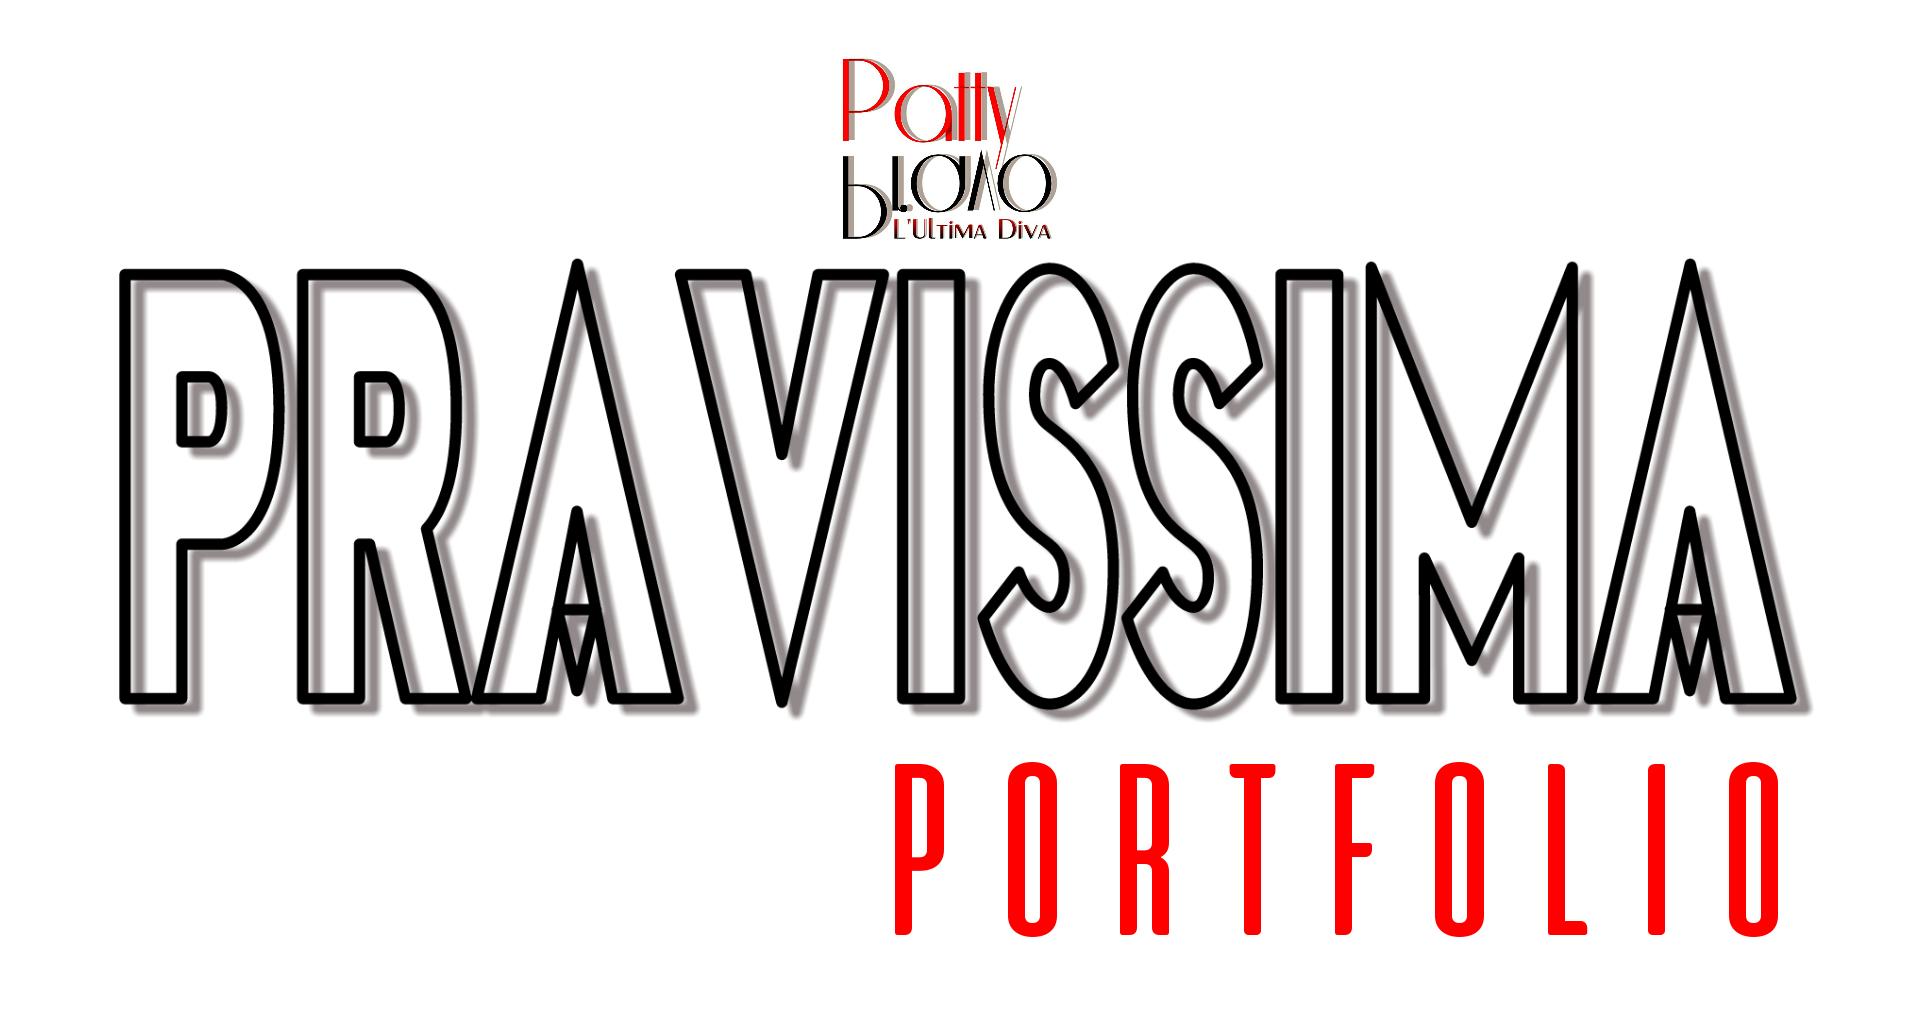 PRAVISSIMA PORTFOLIO – PATTY PRAVO UNIVERSO DI IMMAGINI – WORDPRESS